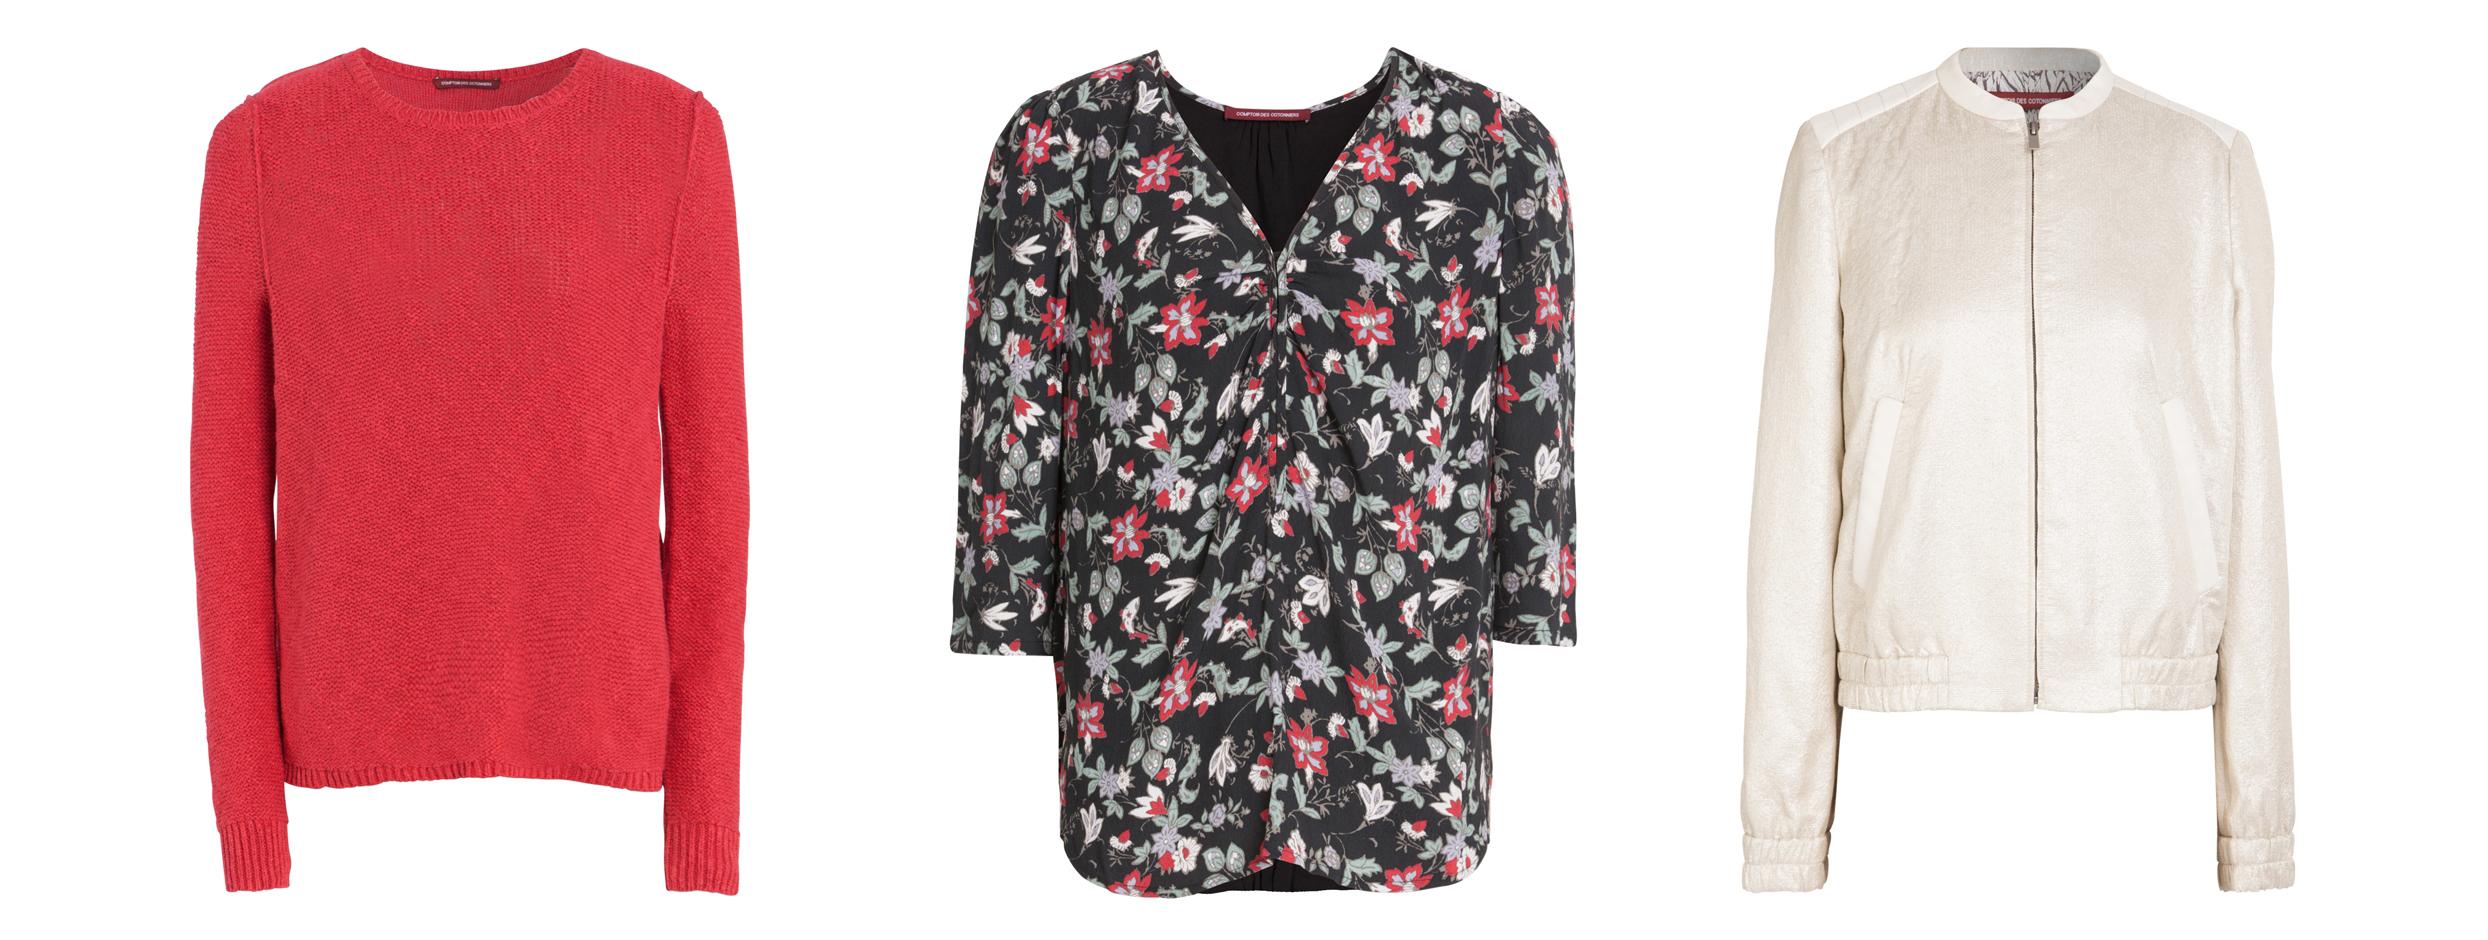 trendy_taste-look-outfit-blog-blogger-fashion_spain-moda_españa-giveaway-sorteo-comptoir_des_cotonniers-collage-4